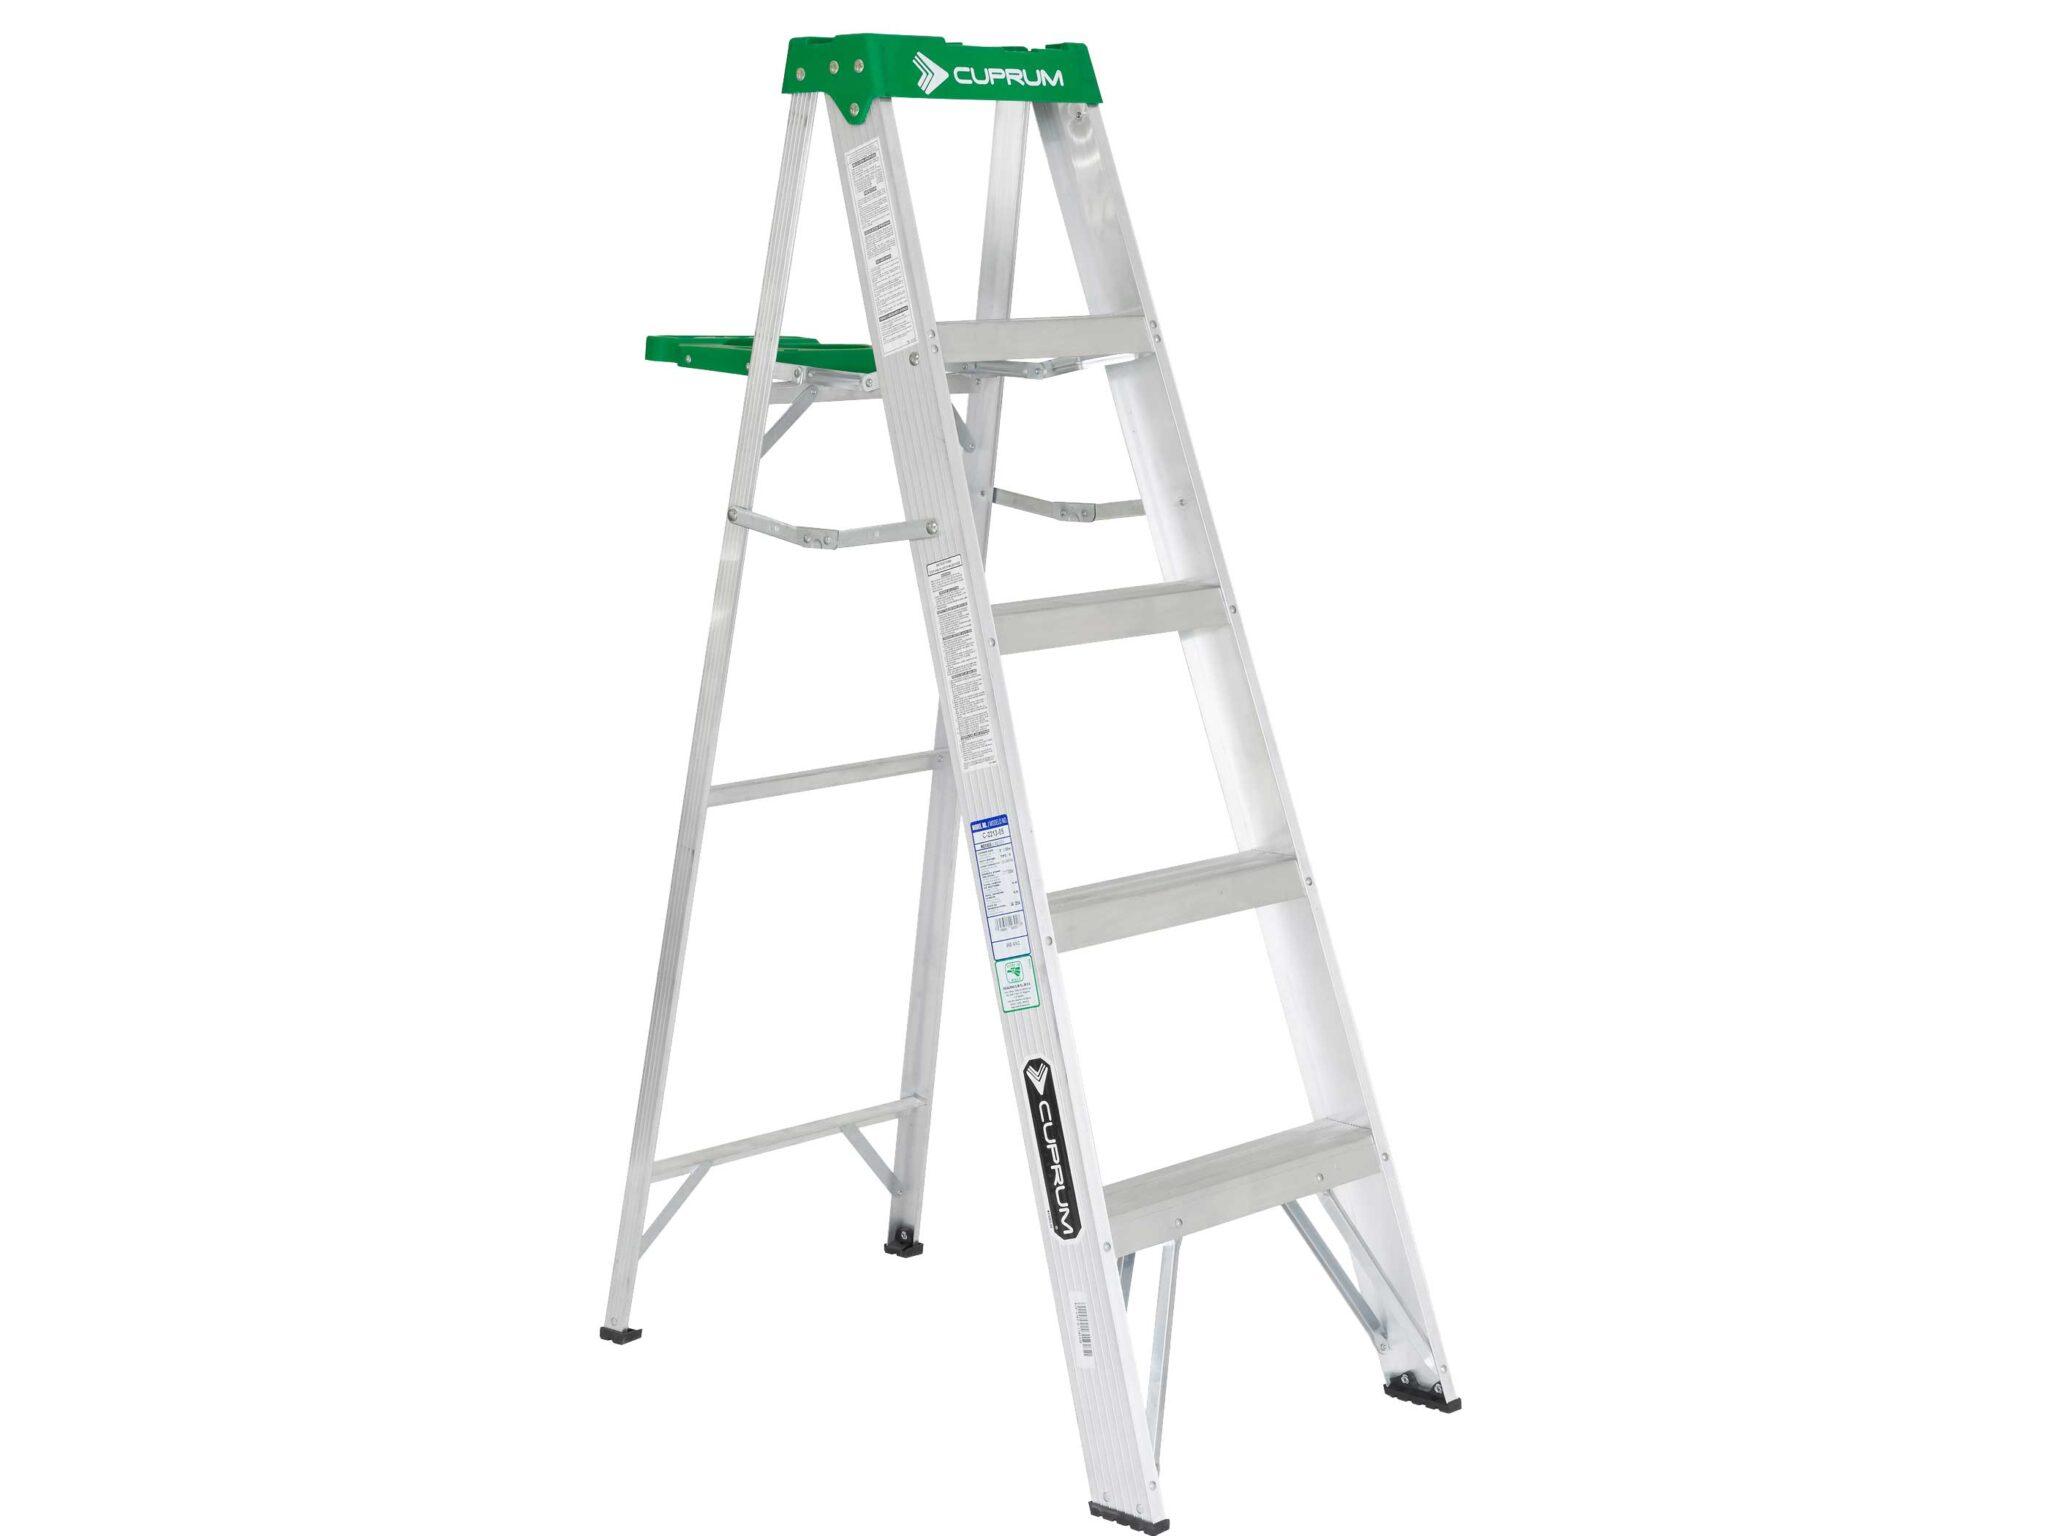 Escalera de tijera de aluminio 4 pelda os cuprum for Escalera aluminio 5 peldanos